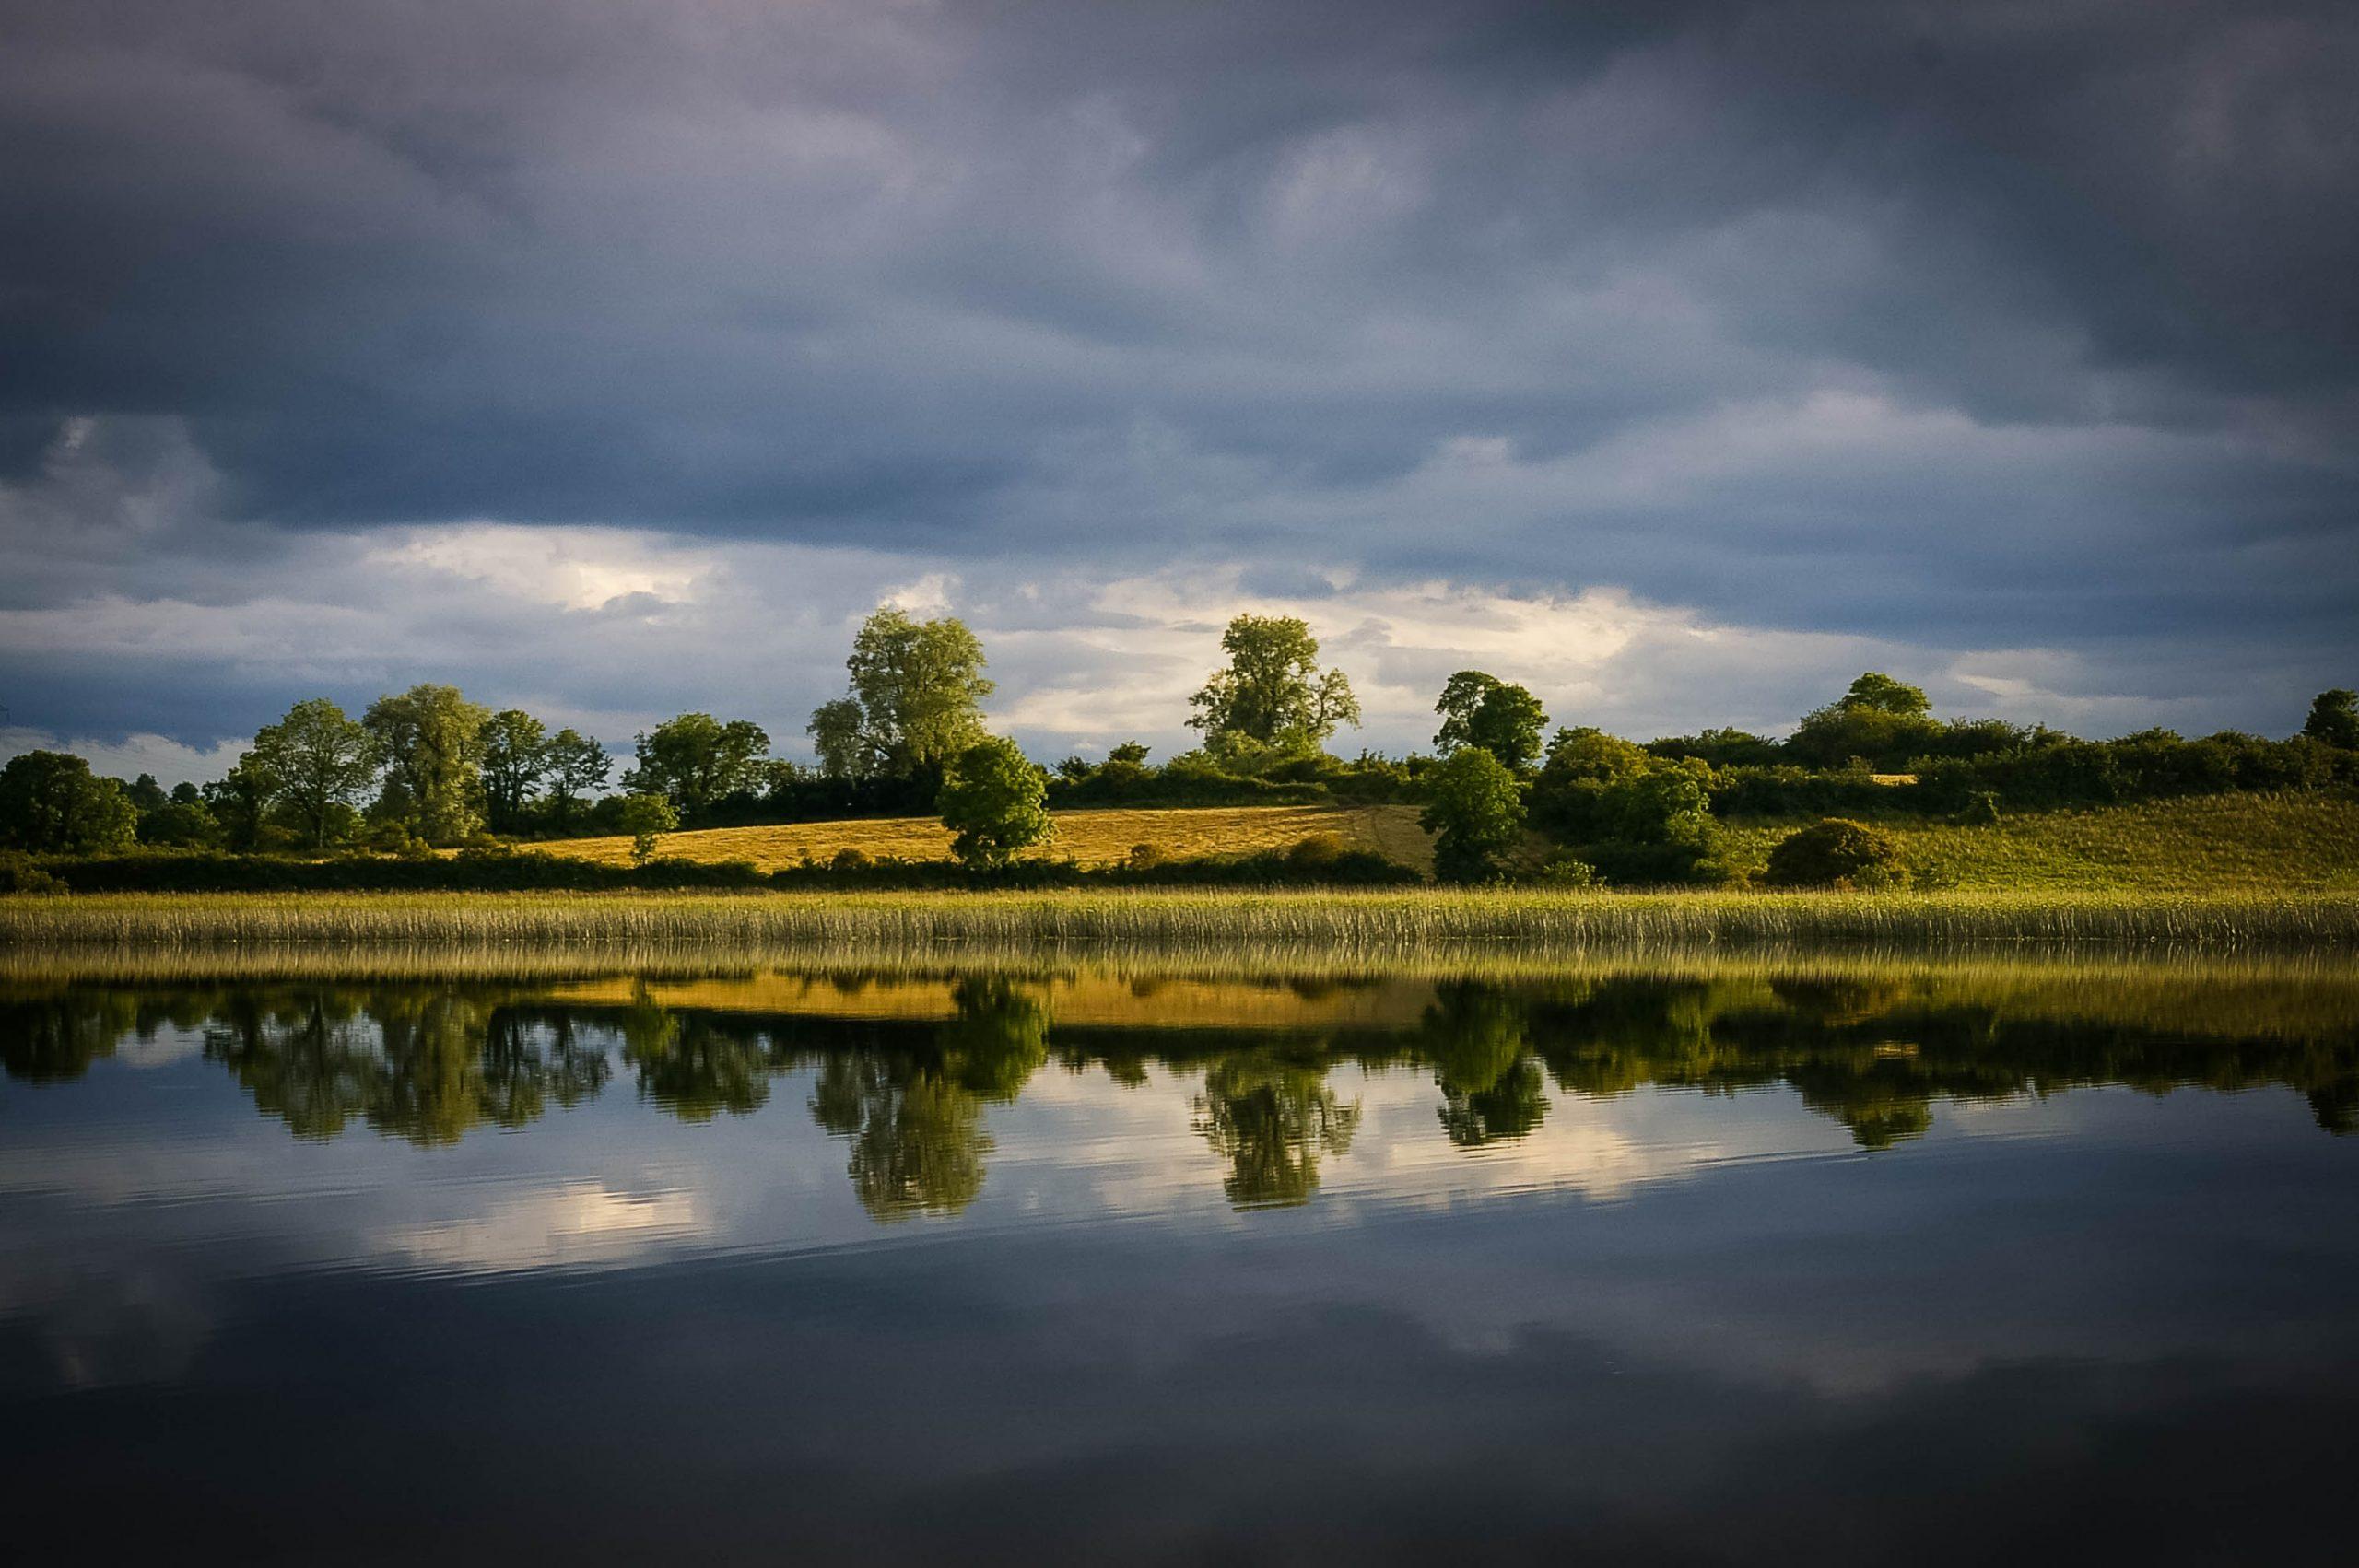 irish-reflections-fiona-madden-photography